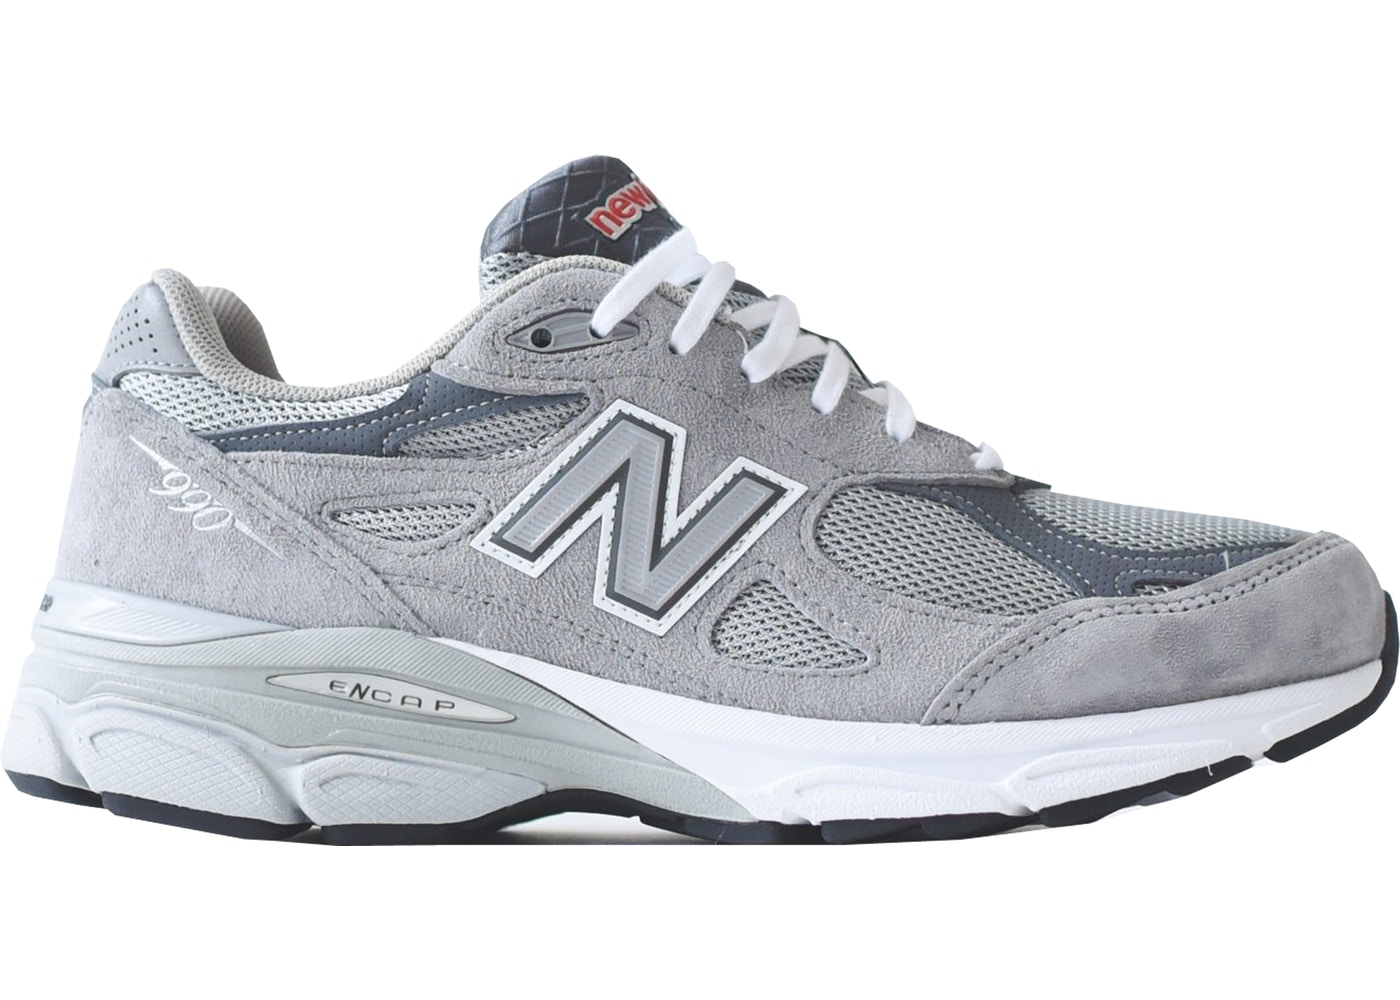 289c2179ada50 New Balance Size 8 Shoes - New Highest Bids